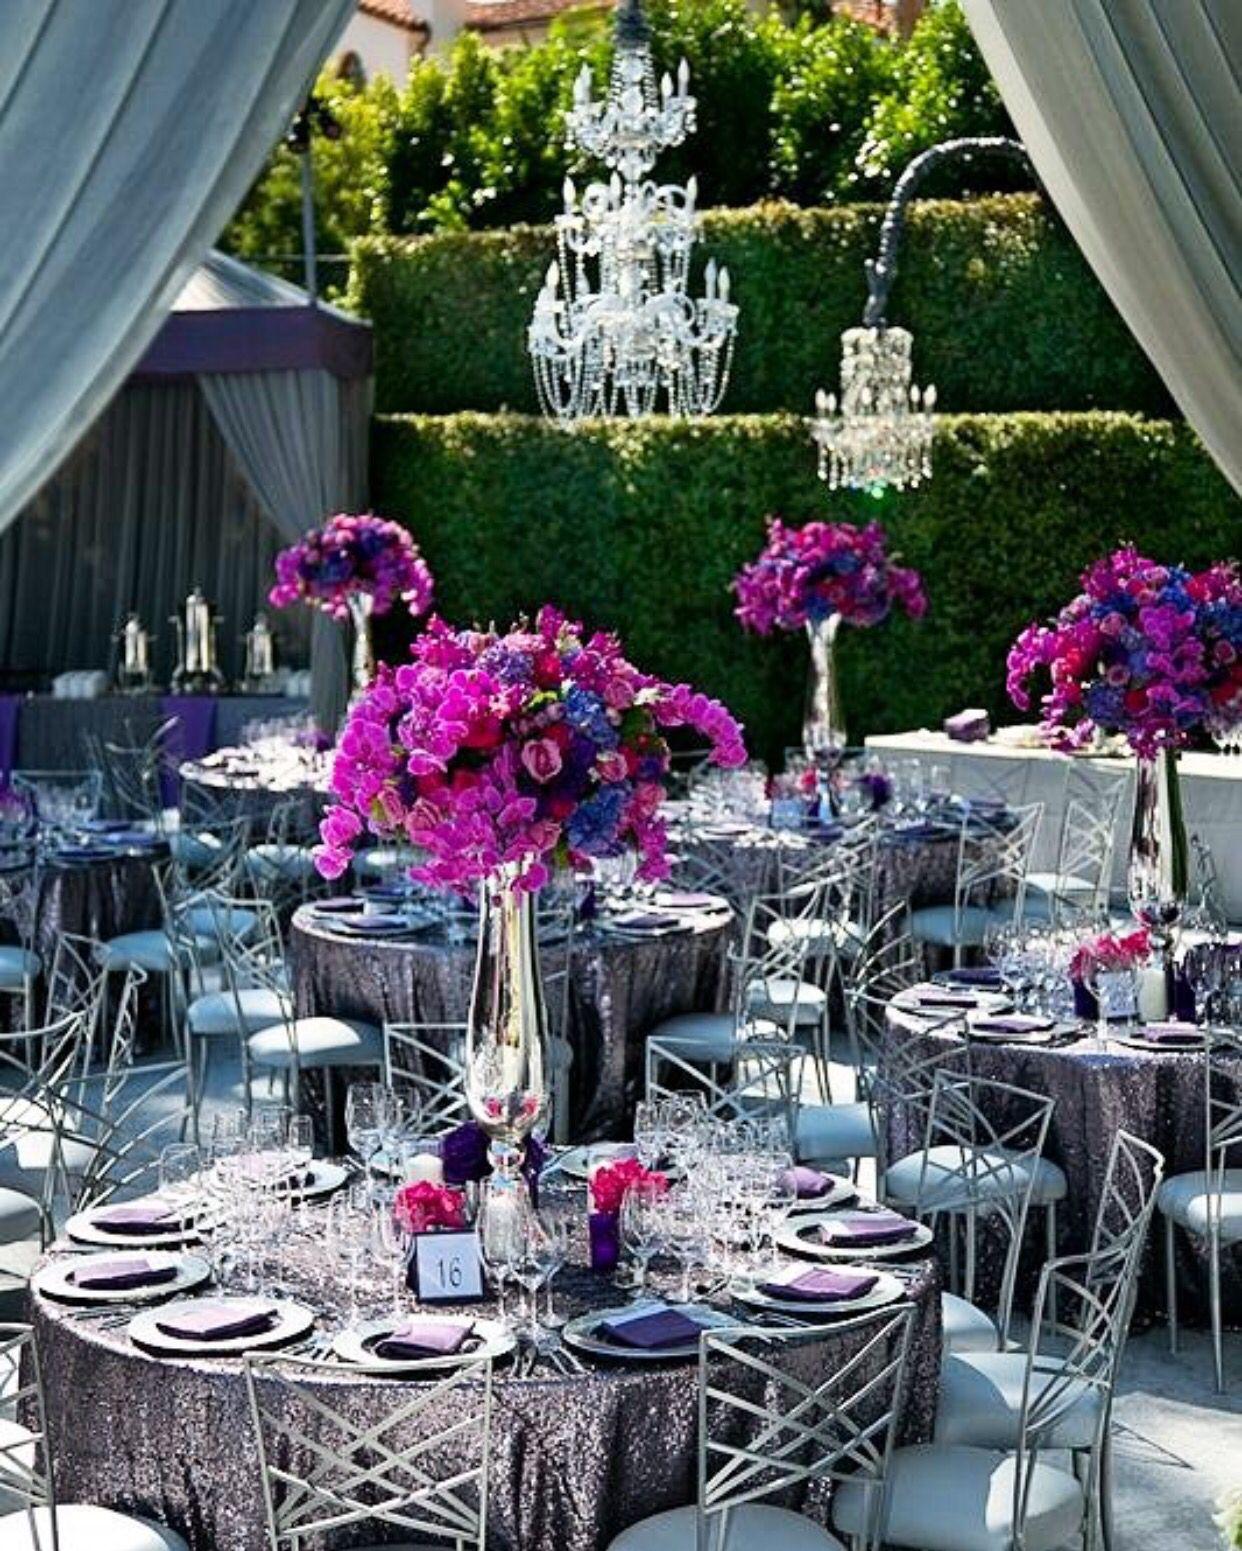 25th wedding decoration ideas  Centros de mesa altos y decoración en plata  When there is a